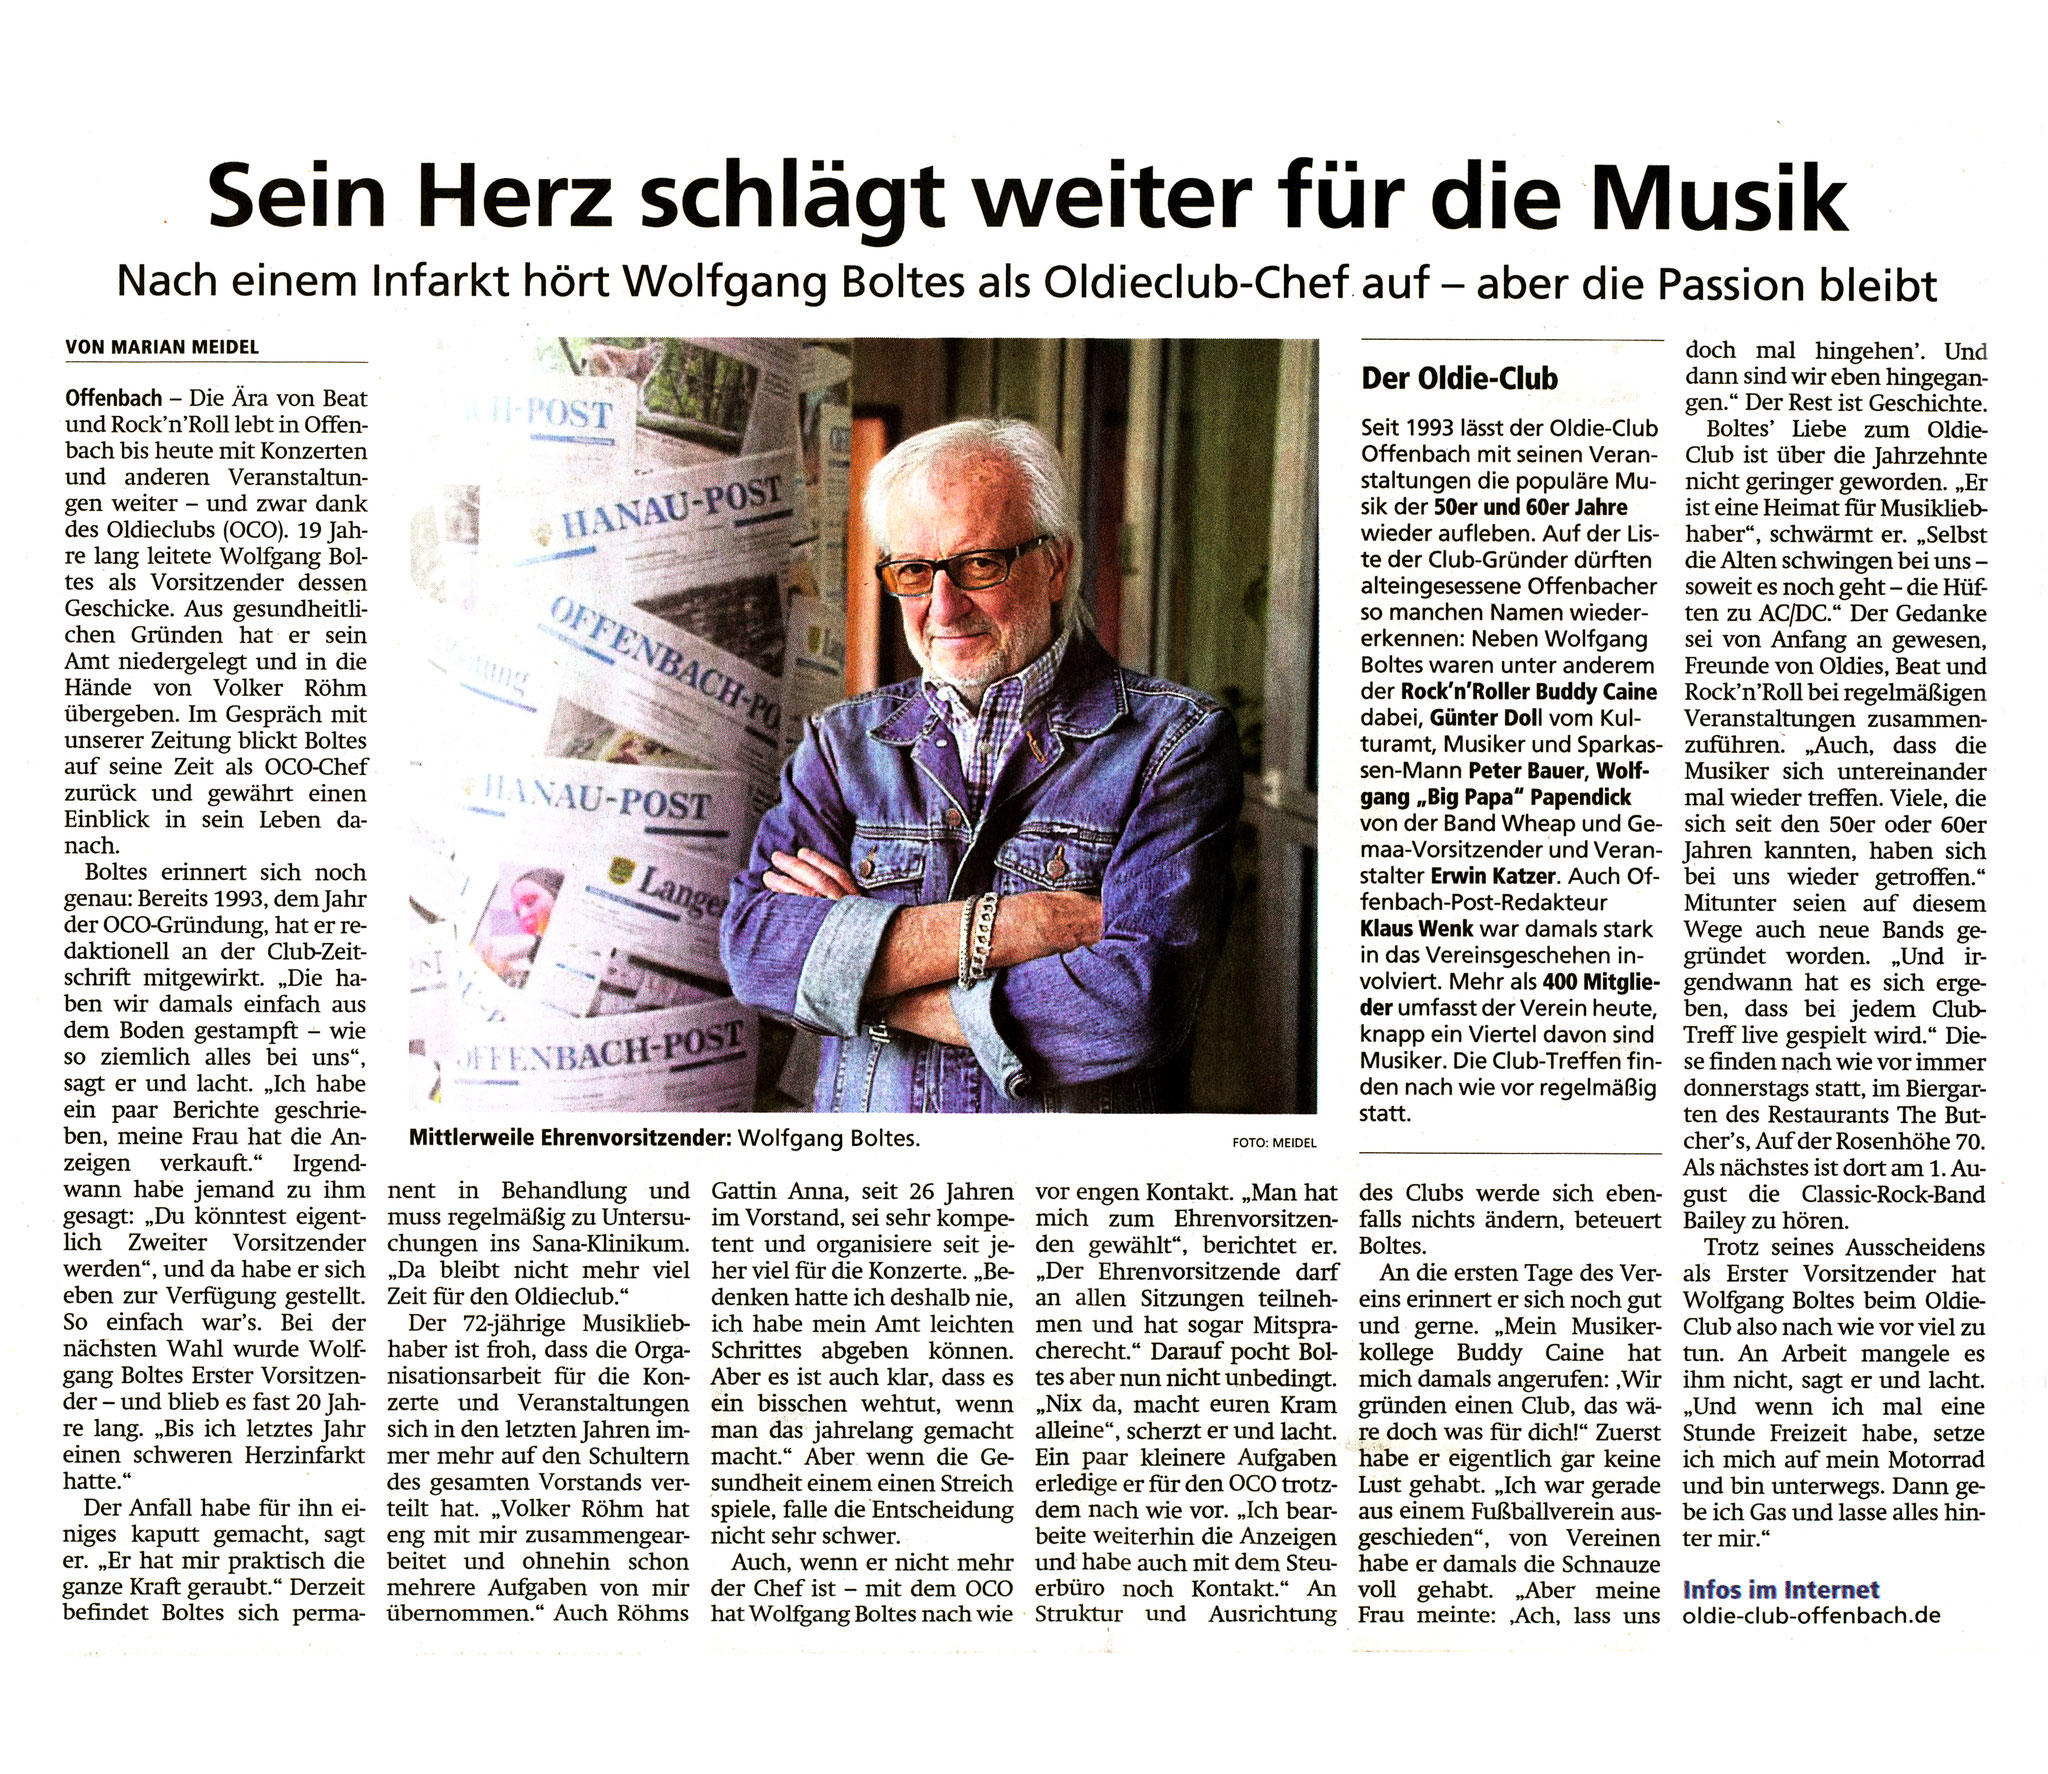 Offenbach Post, 26. Juli 2019